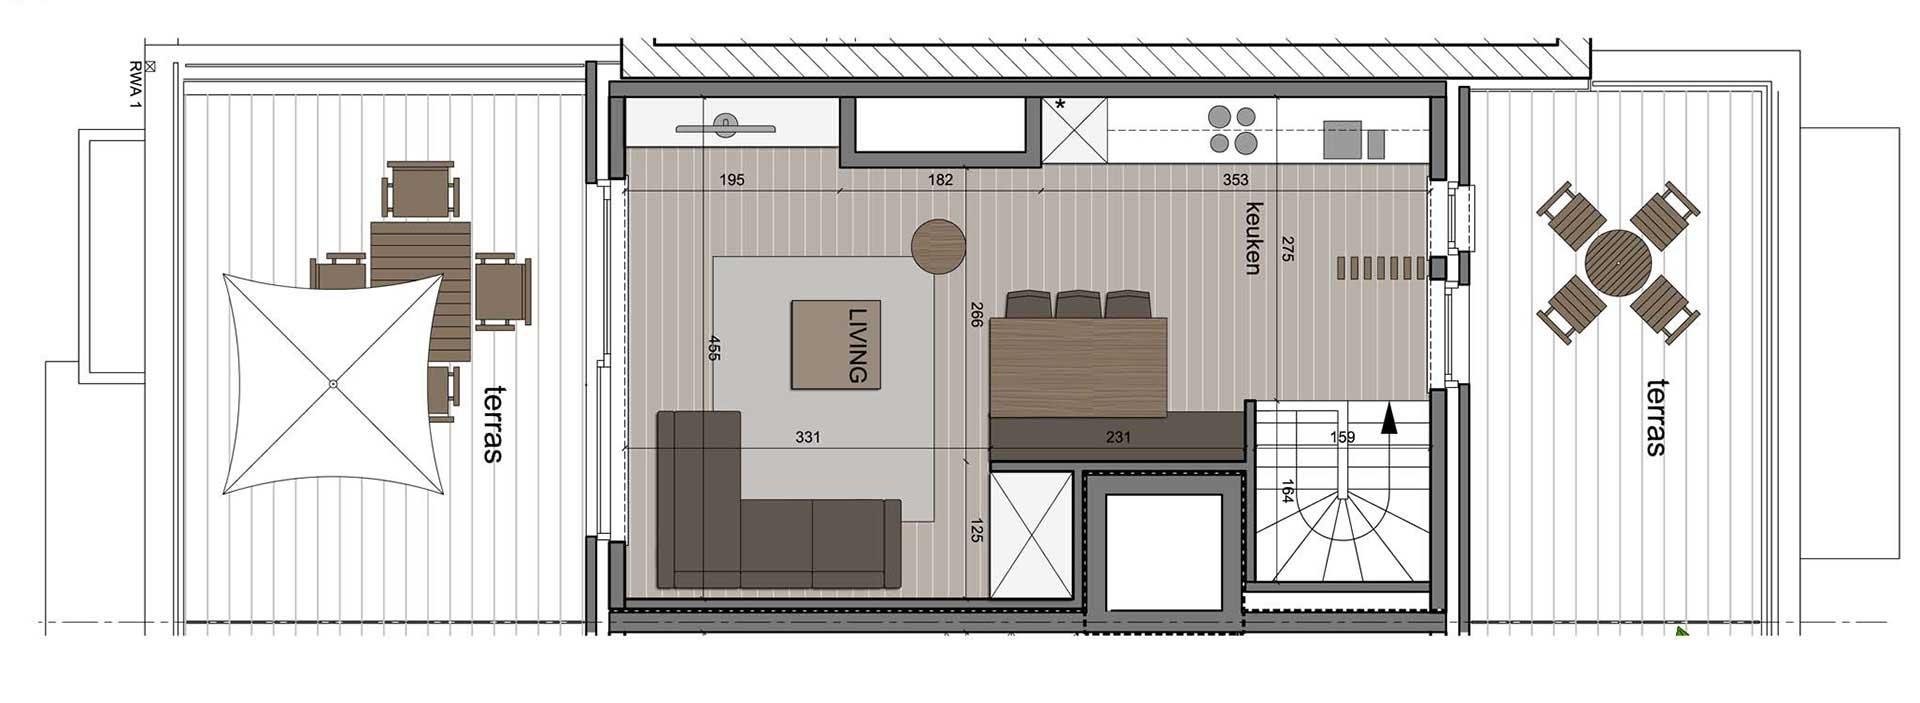 Residentie <br /> Winoc - image nieuwbouwappartement-koksijde-residentie-winoc-6.1.2 on https://hoprom.be